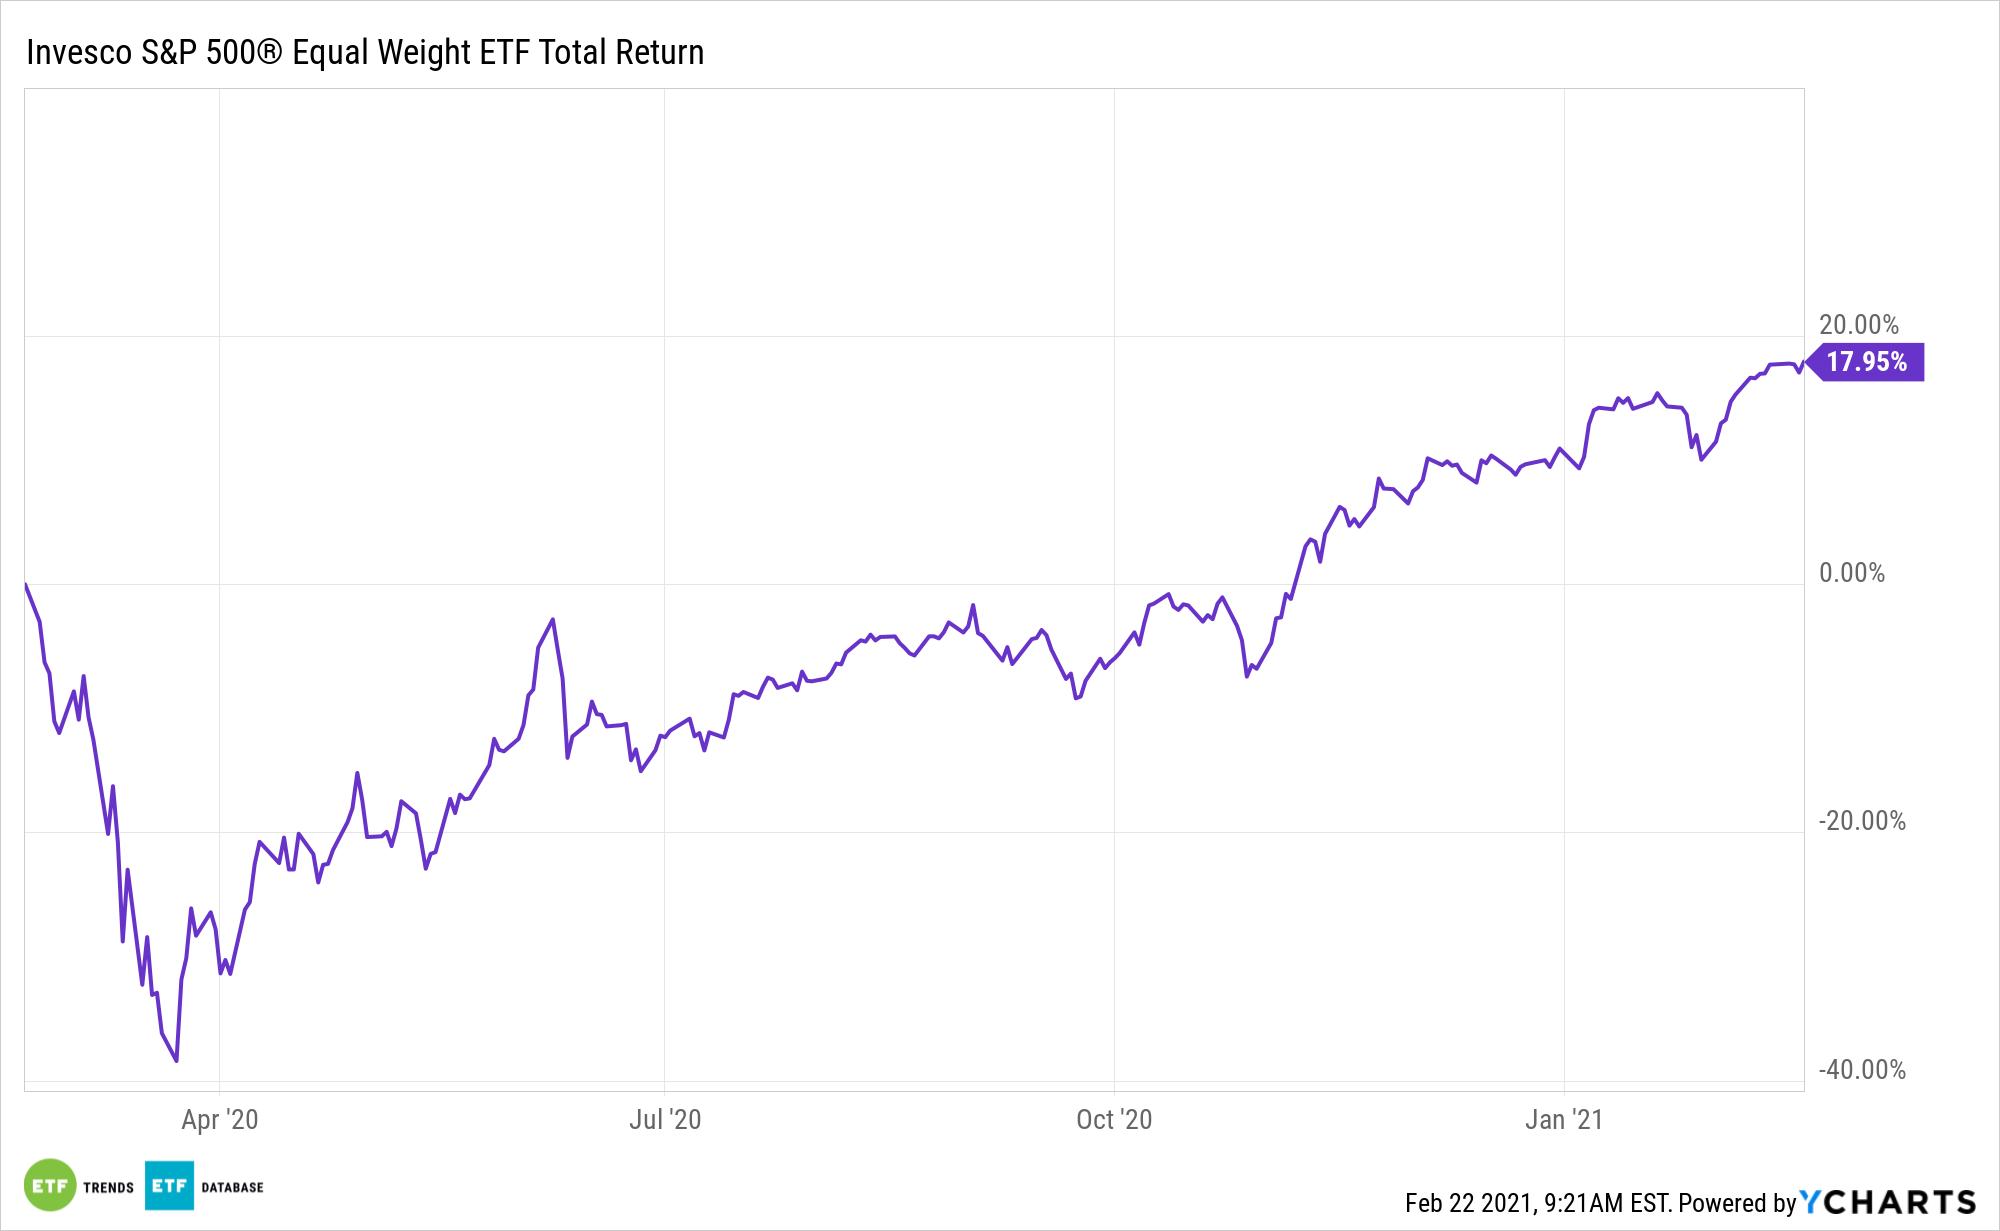 RSP 1 Year Total Return